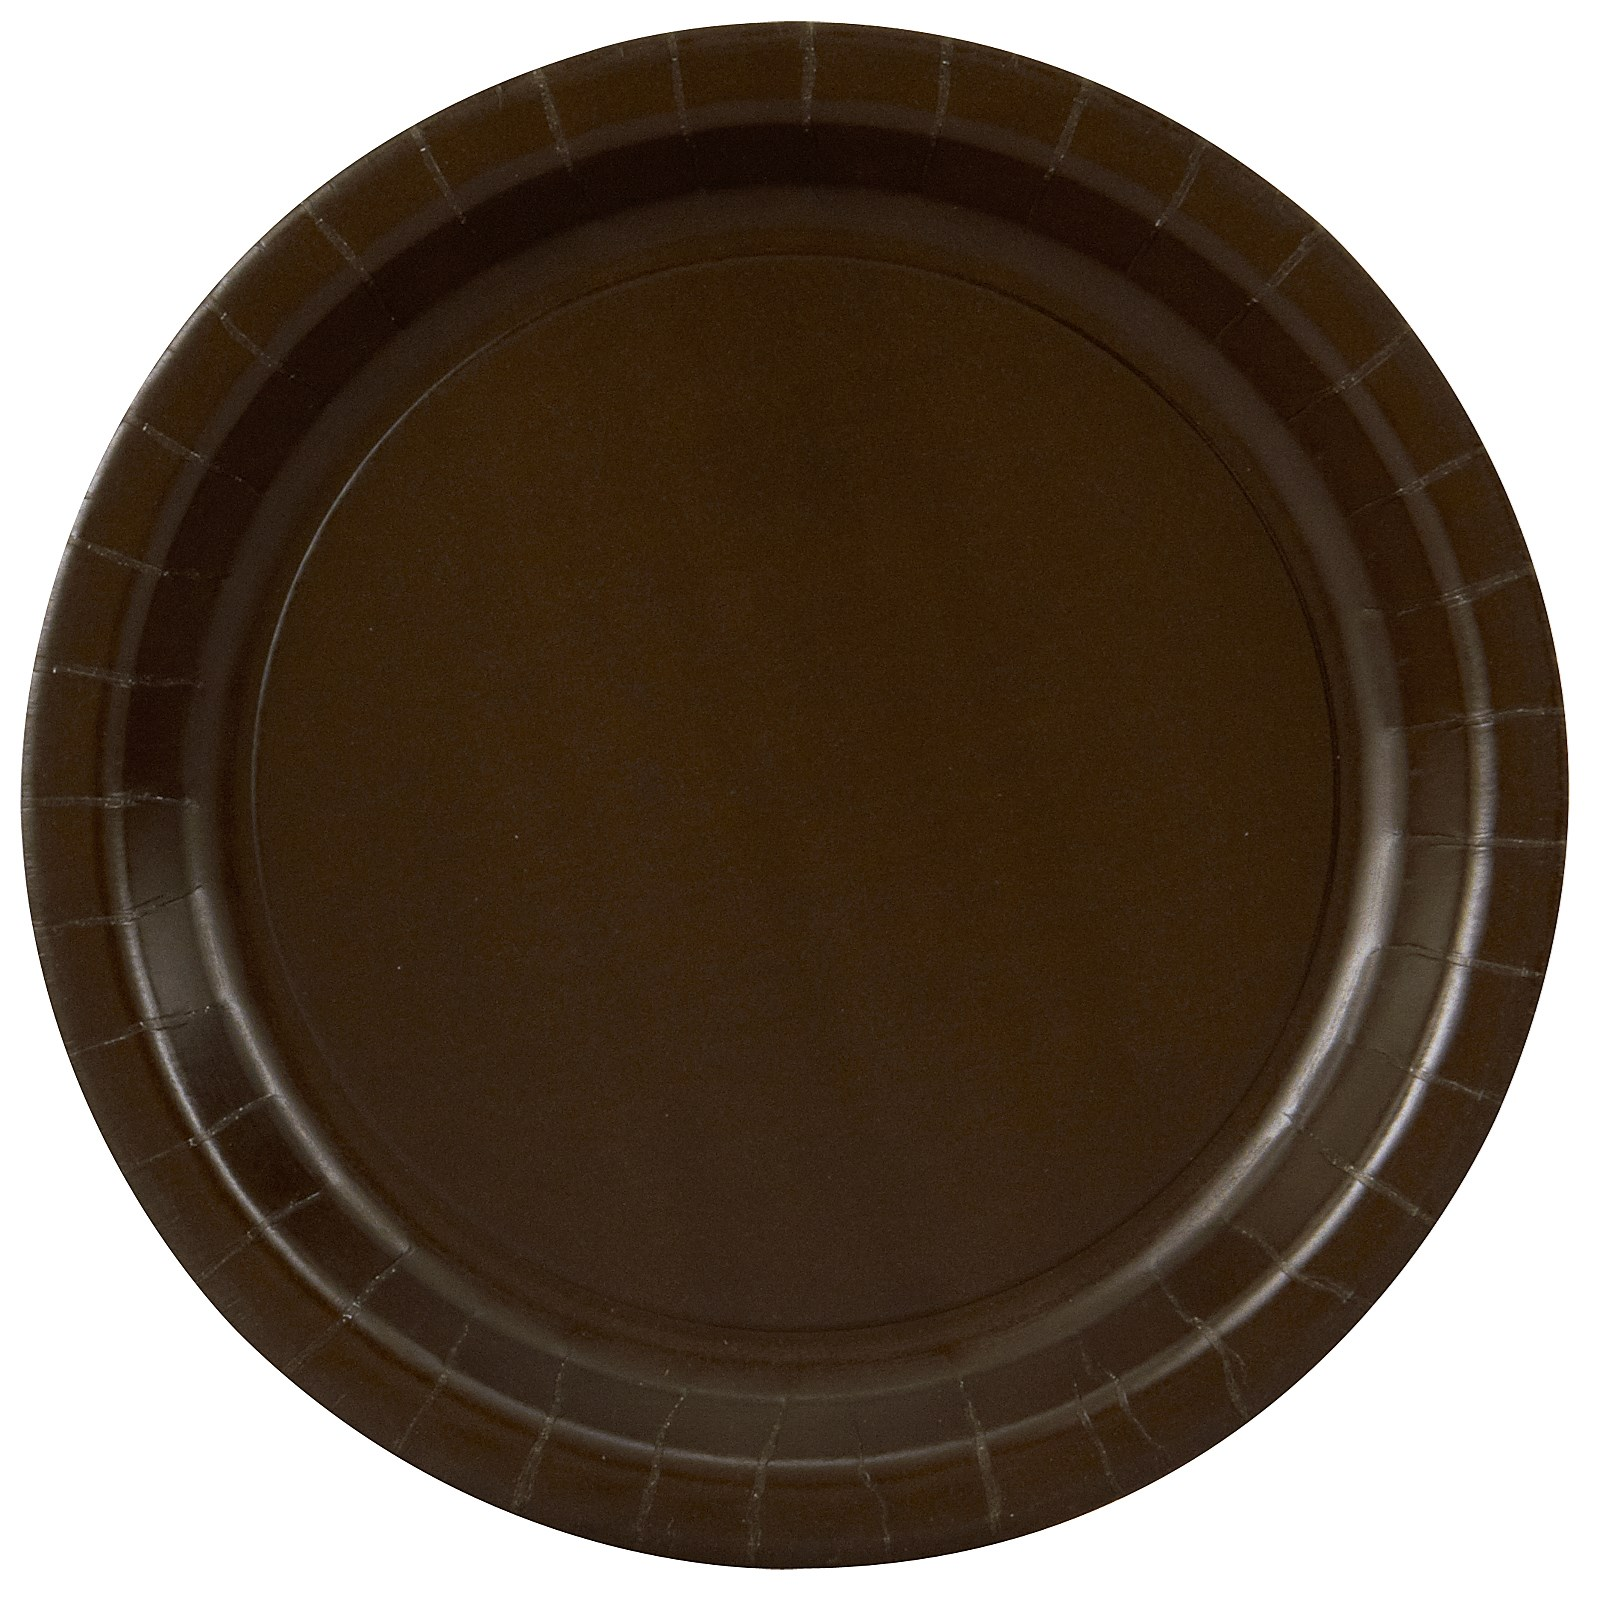 Chocolate Brown (Brown) Dinner Plates | BirthdayExpress.com